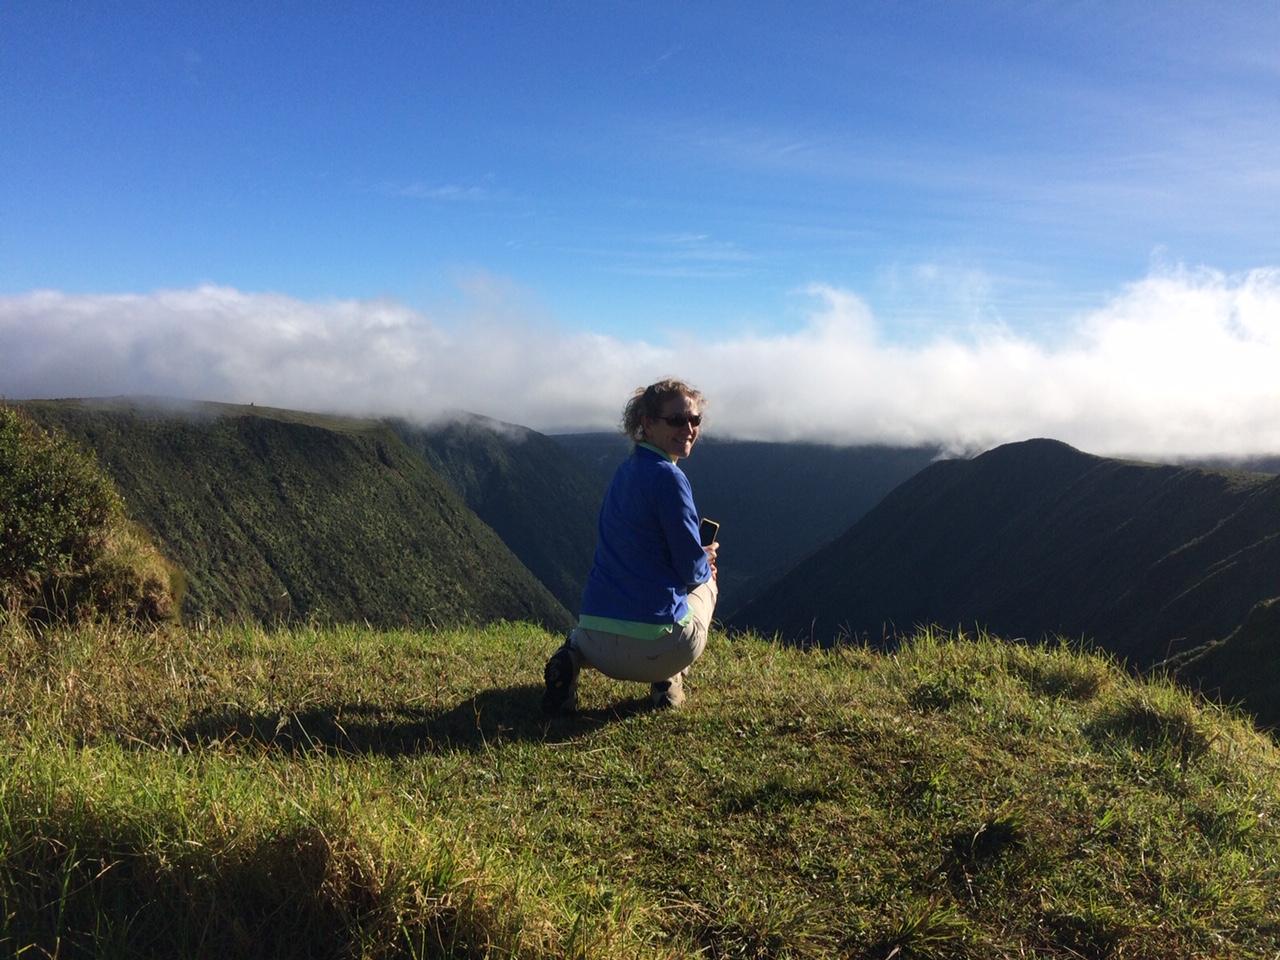 """I like traveling, hiking, camping."" Photo: Carolyn Stewart"